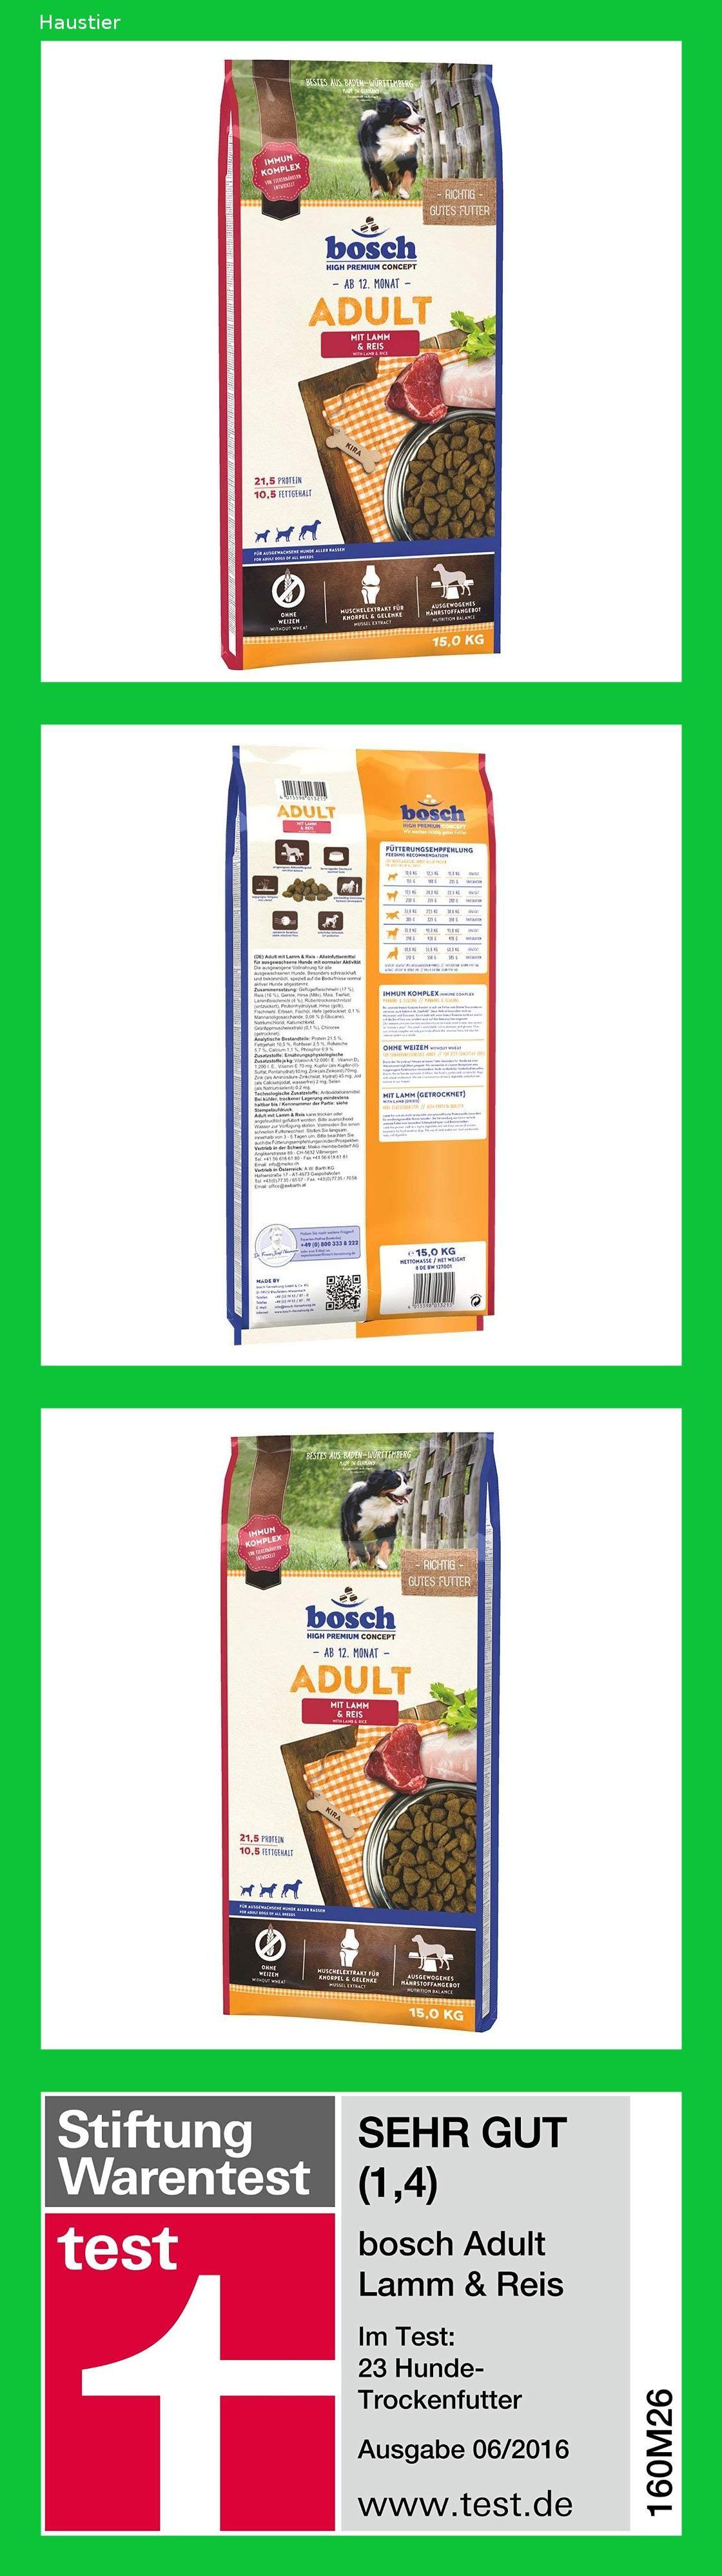 Bosch Hundefutter Adult Lamm Und Reis Bosch Hundefutter Hundetrockenfutter Und Hundefutter